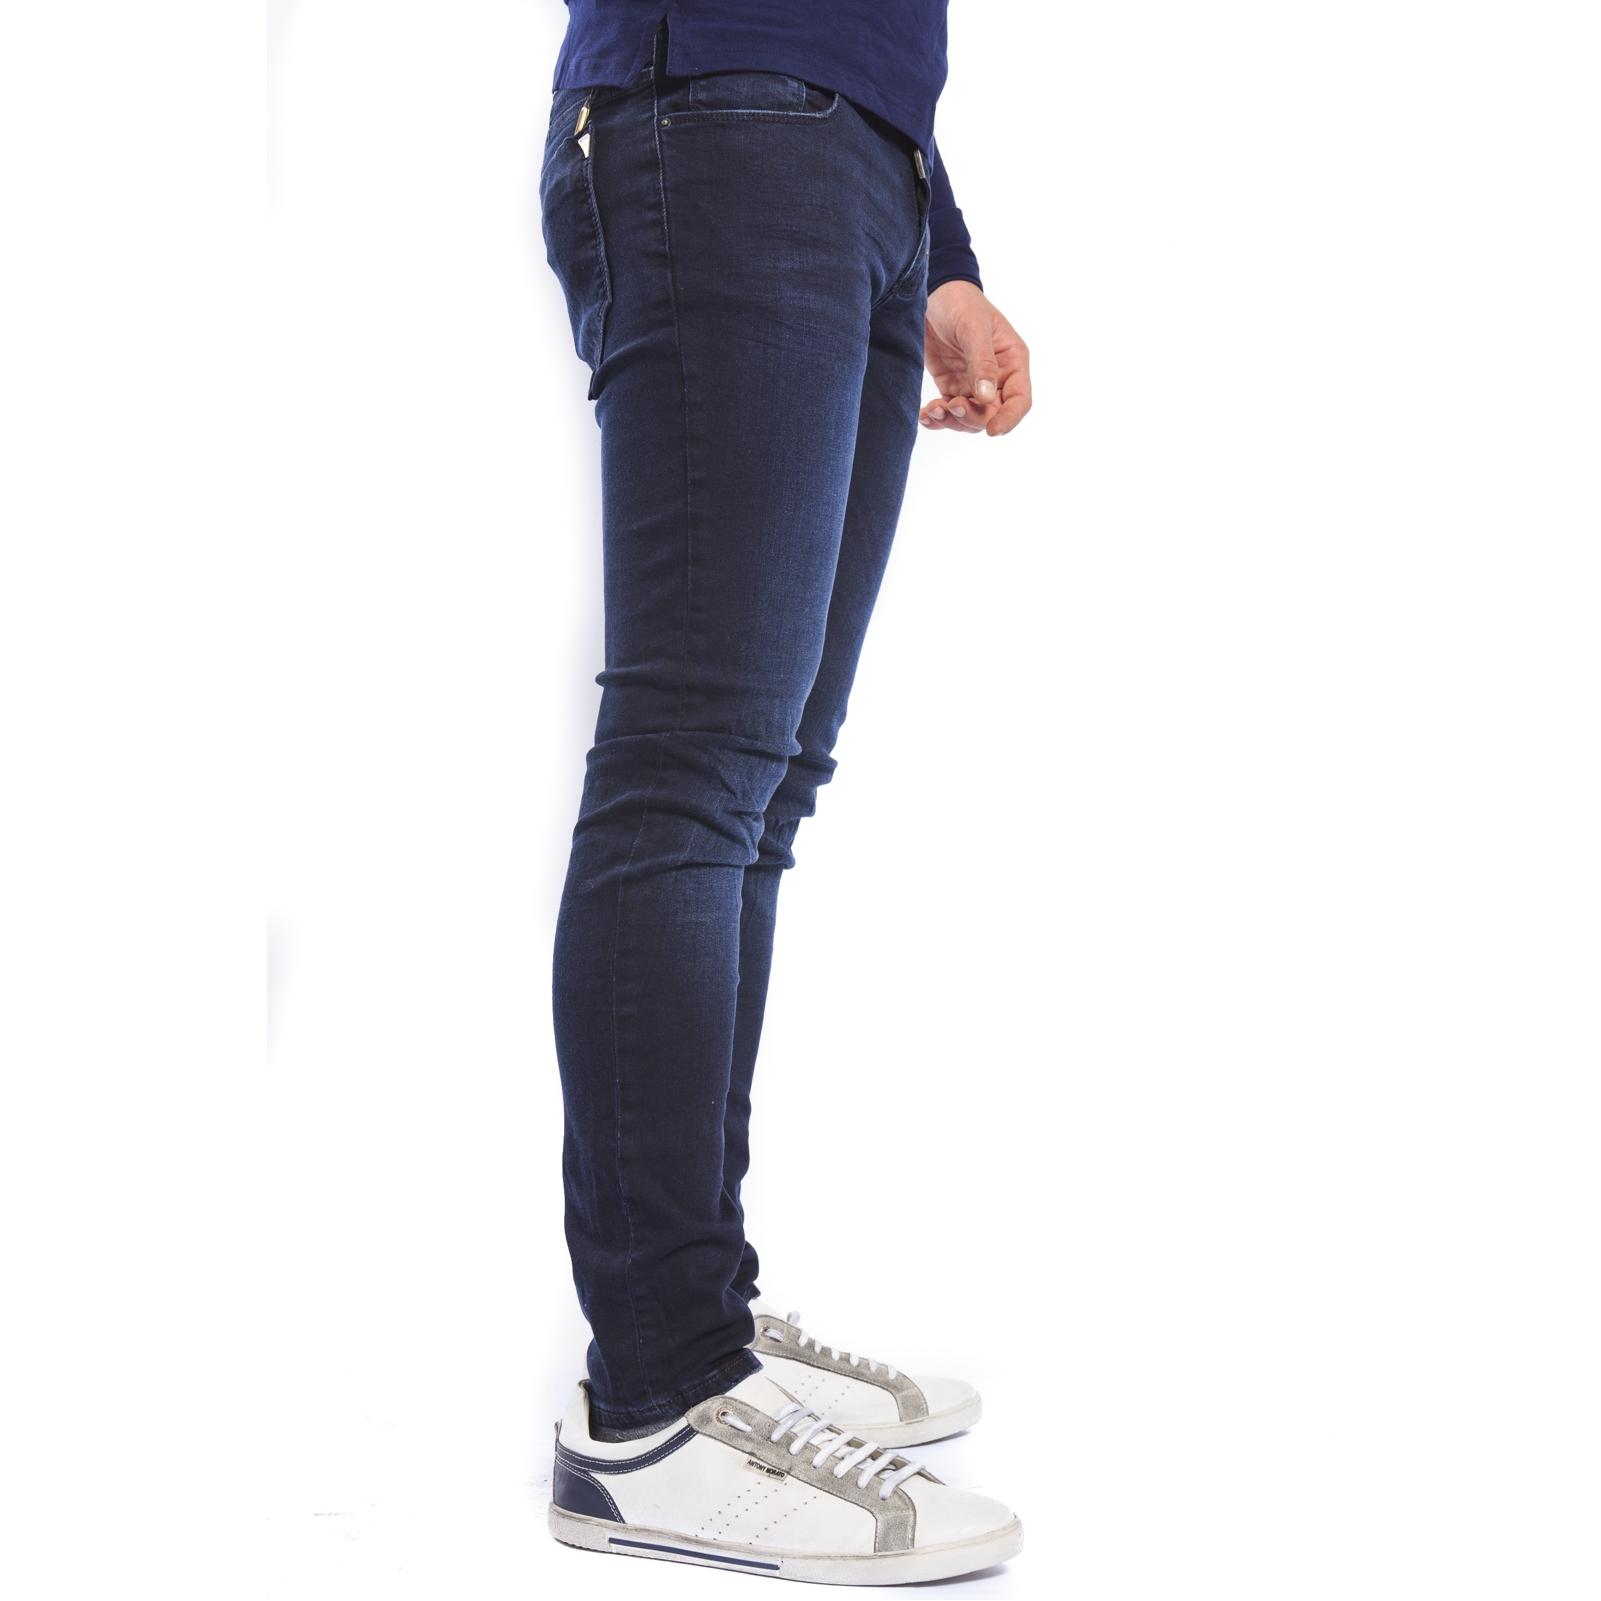 e52200ef296712 ANTONY MORATO Jeans Don Giovanni Super Skinny DENIM MMDT00060 NEW